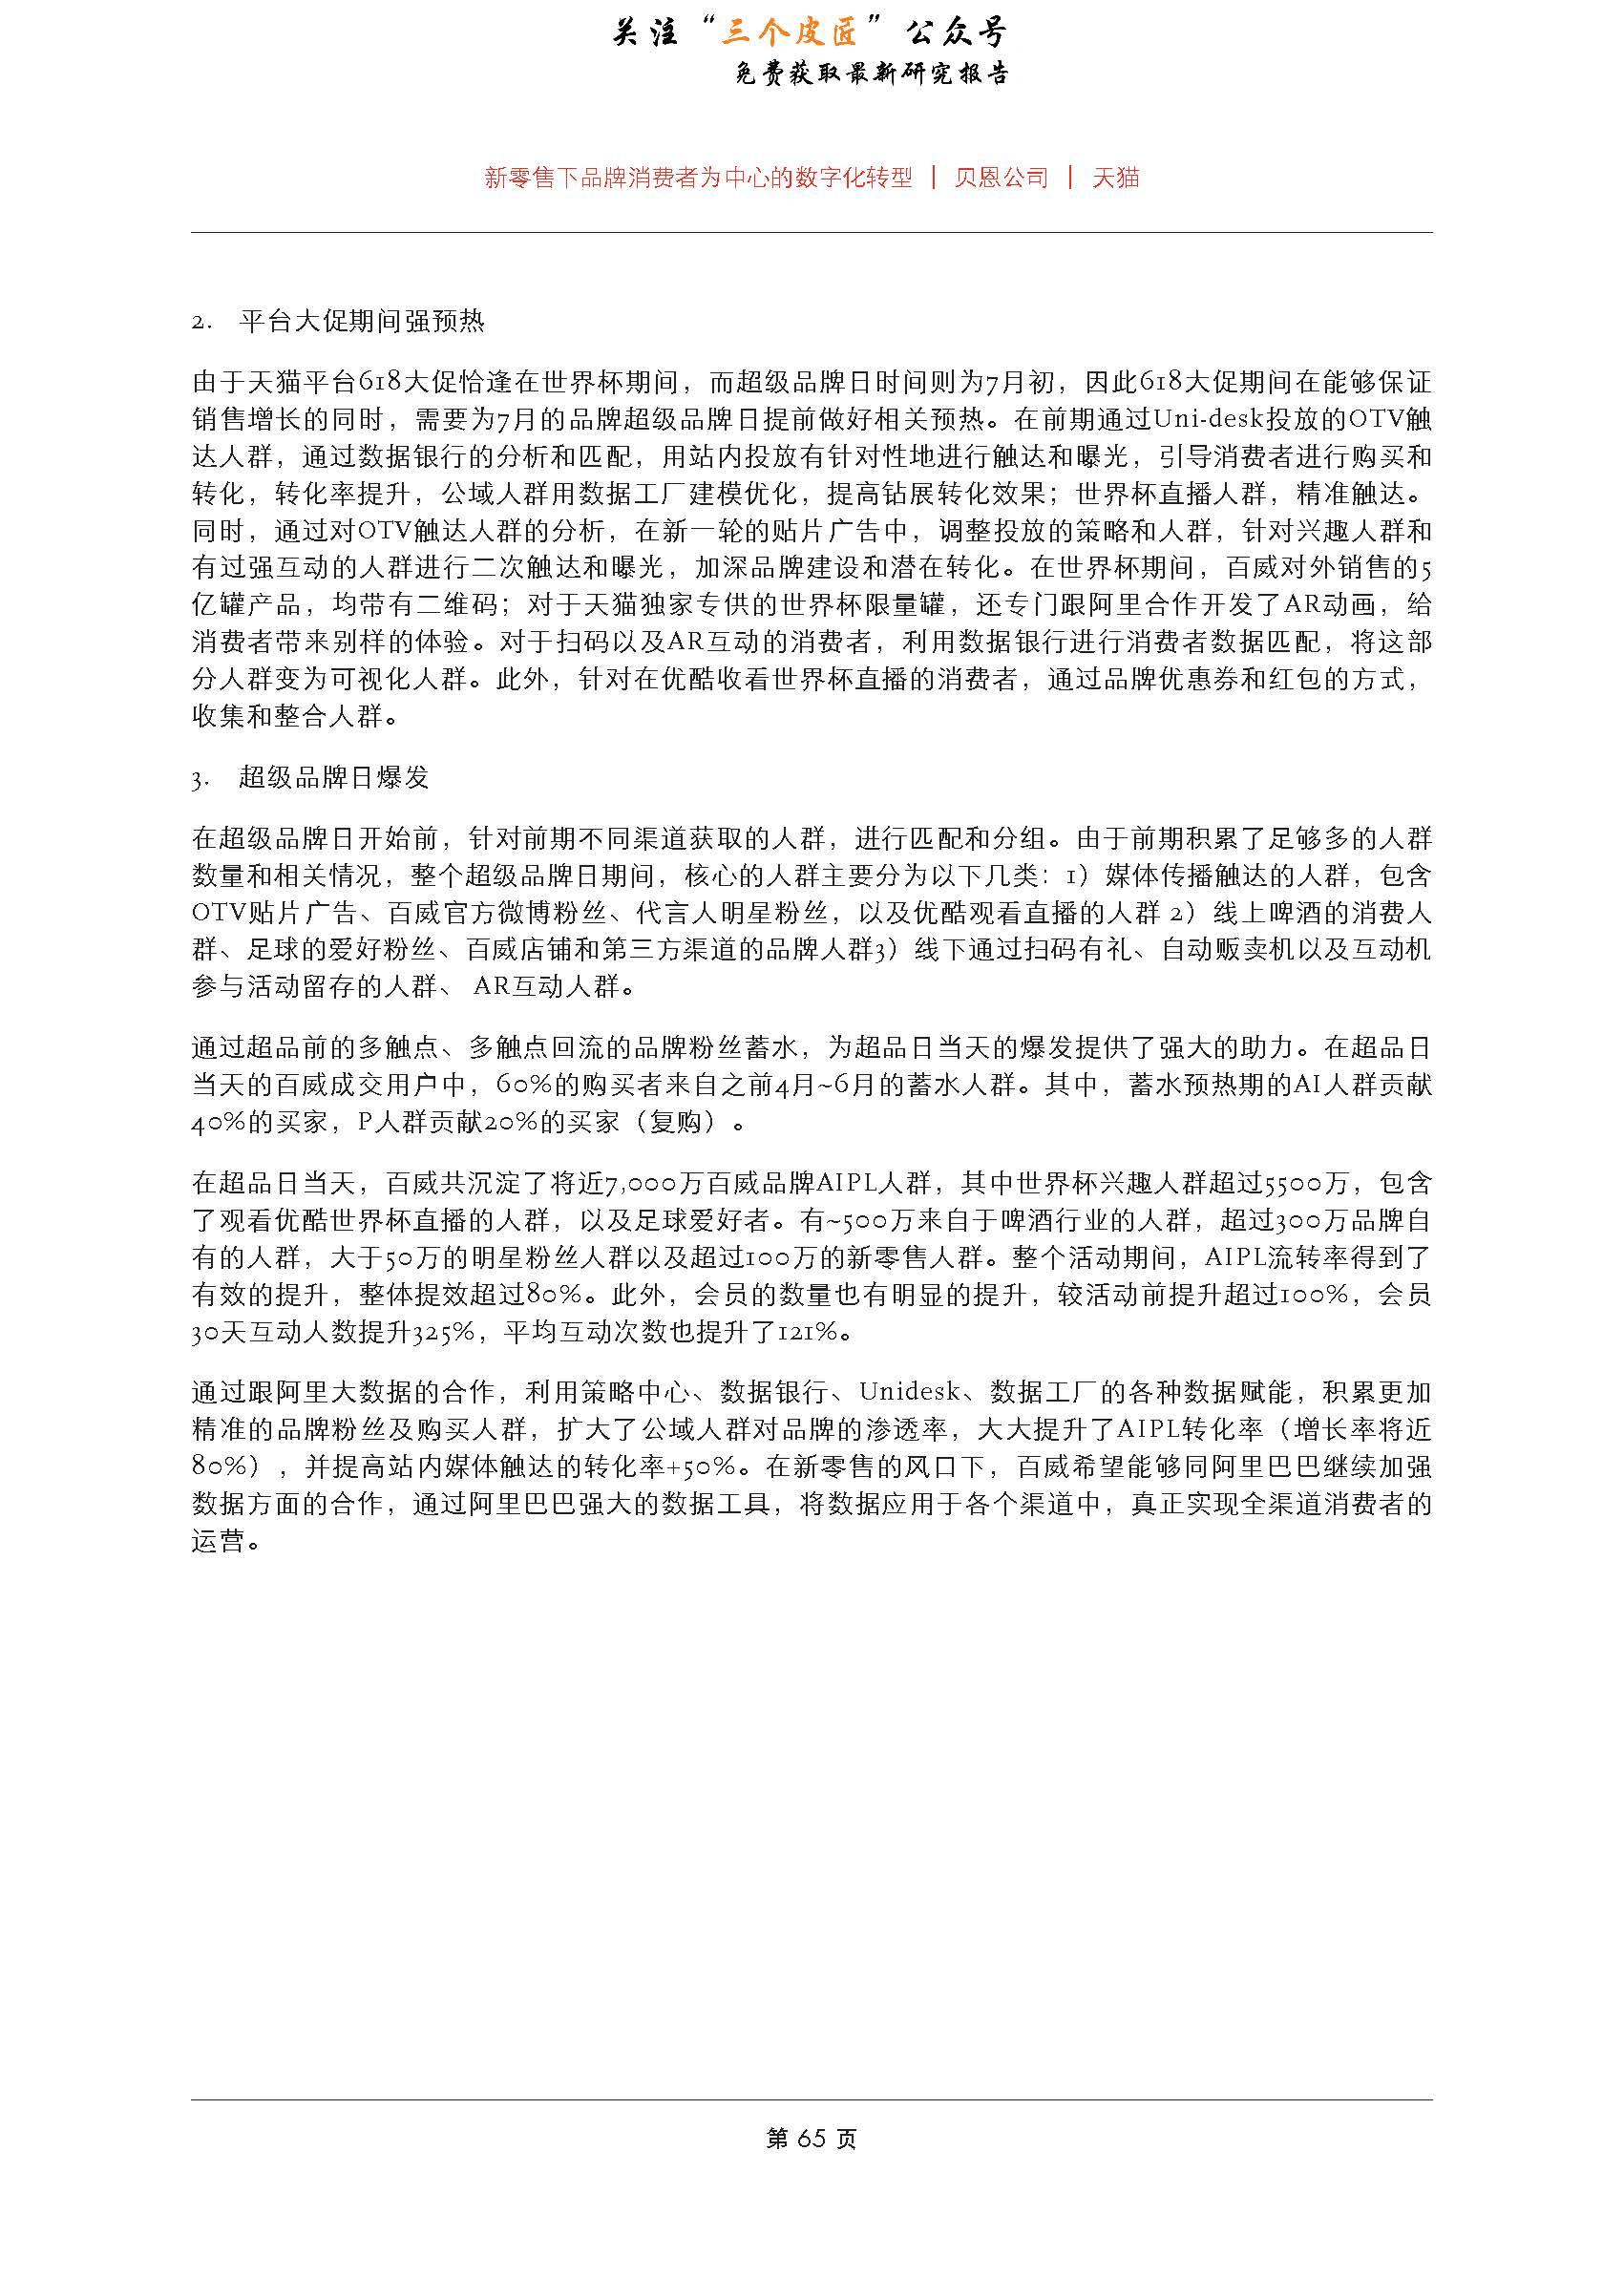 1_Page_67.jpg